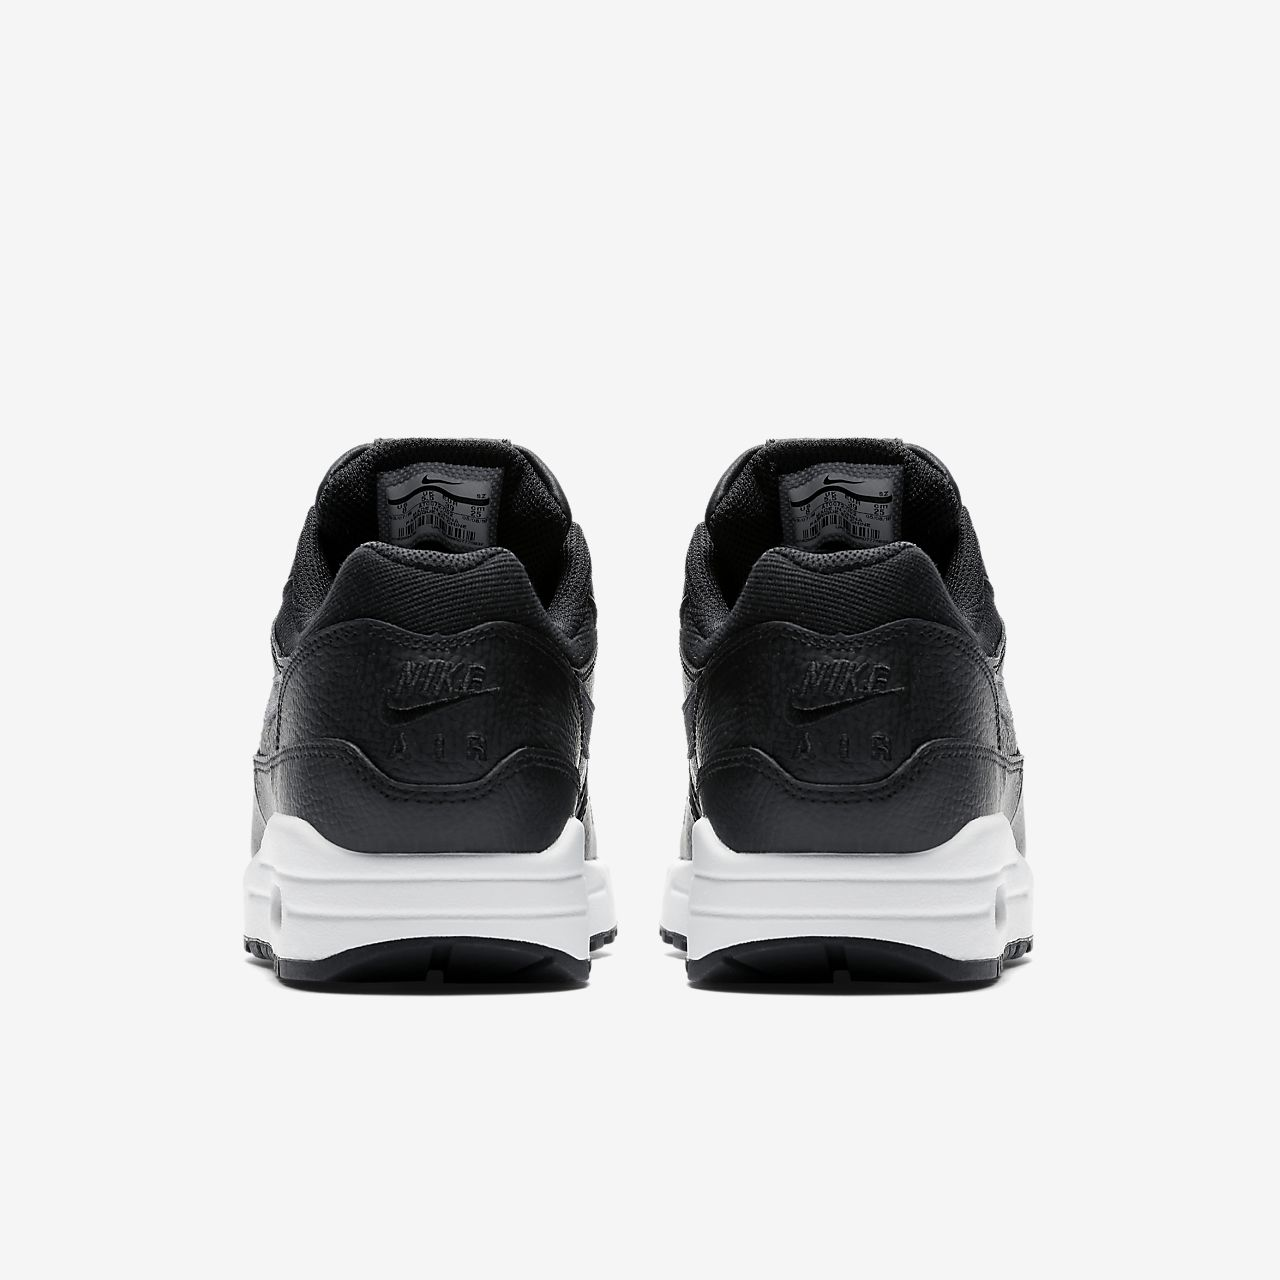 8653948a9a9bc Nike Air Max 1 SE Glitter Women s Shoe. Nike.com IE